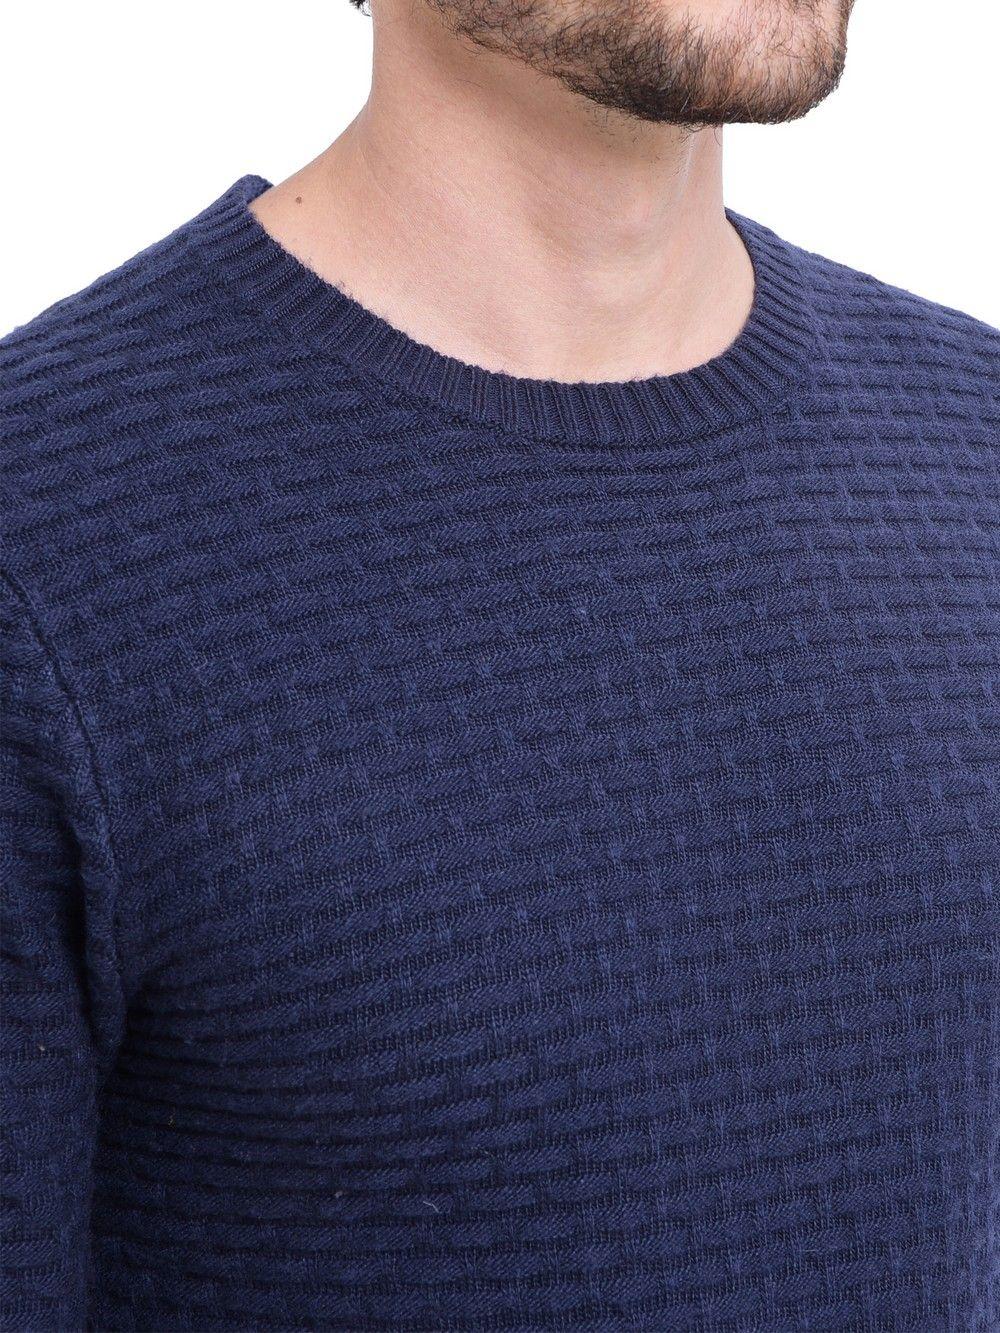 C&JO Round Neck Jacquard Sweater in Navy